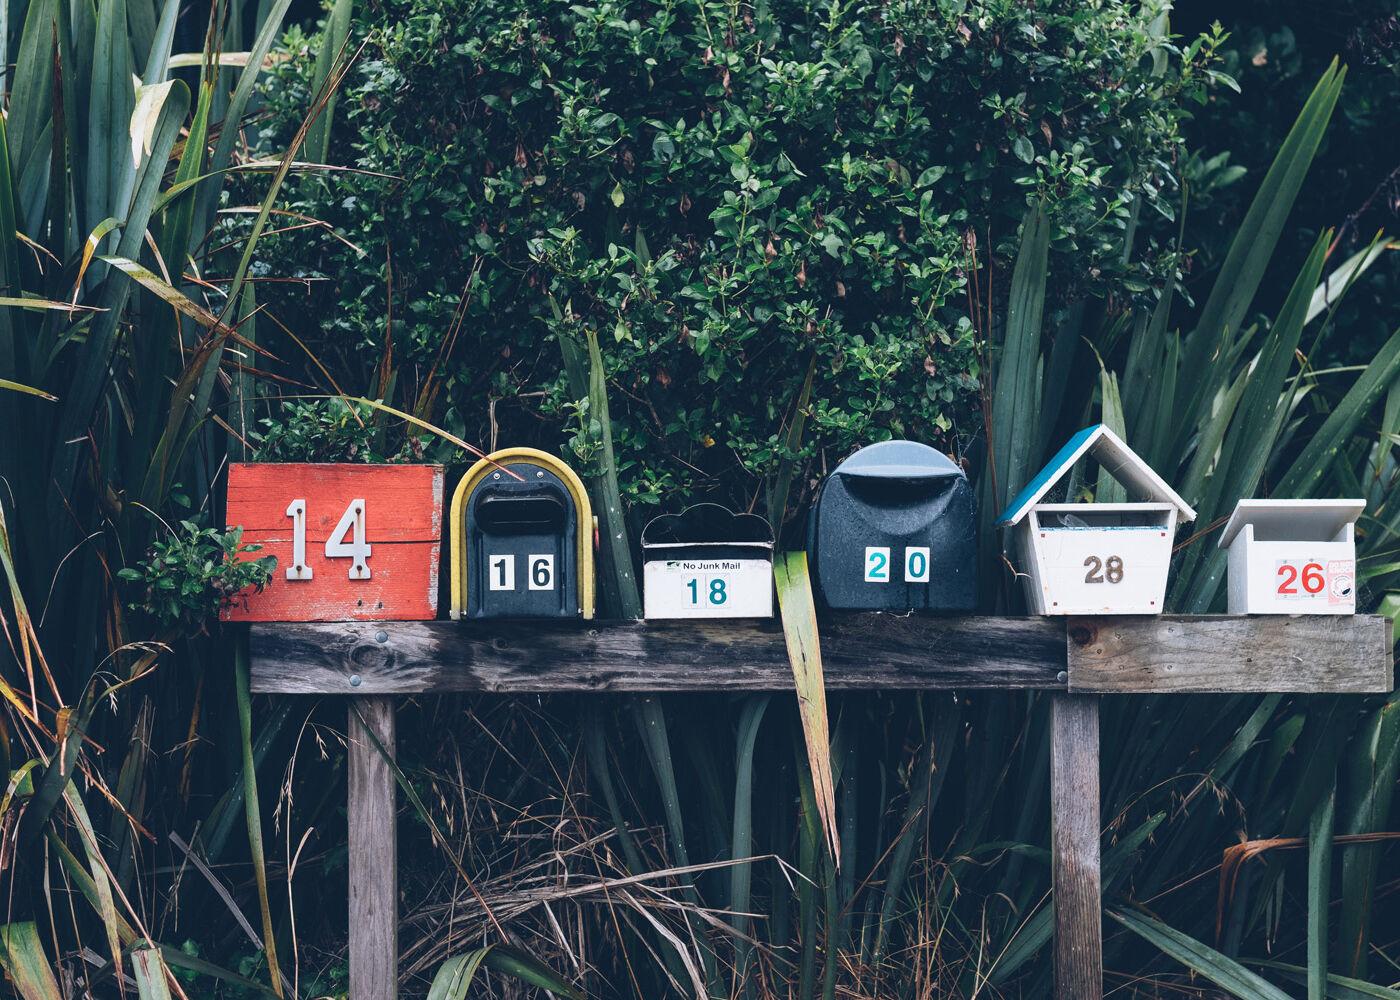 Direktna pošta marketinške aktivnosti pod črto oglaševanje pod črto rezultati